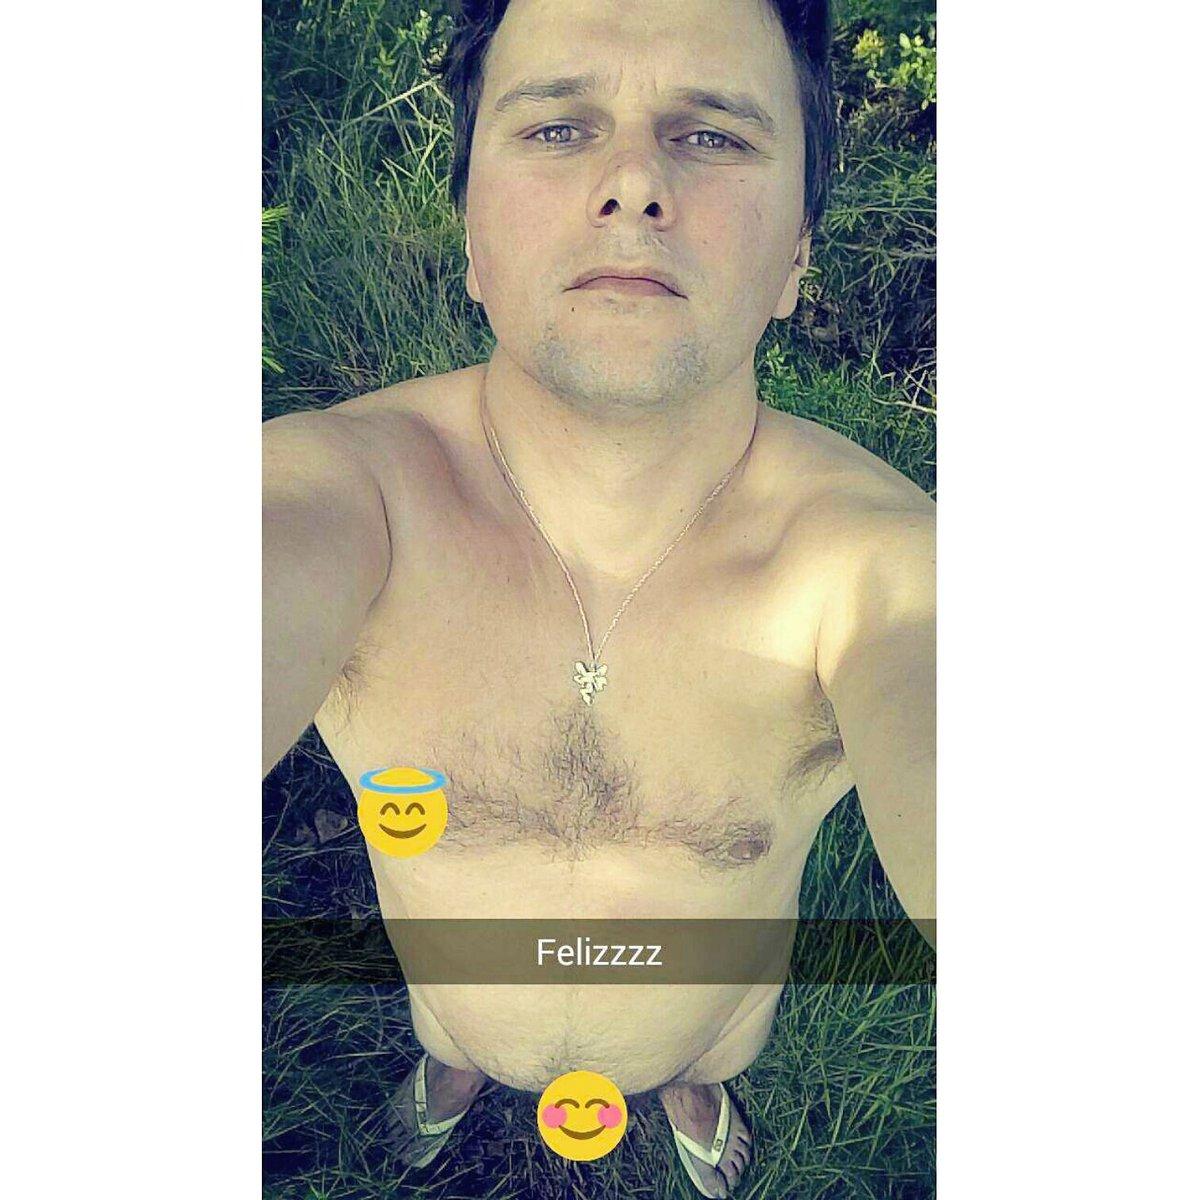 Alloz Gay Porn allozgay hashtag on twitter